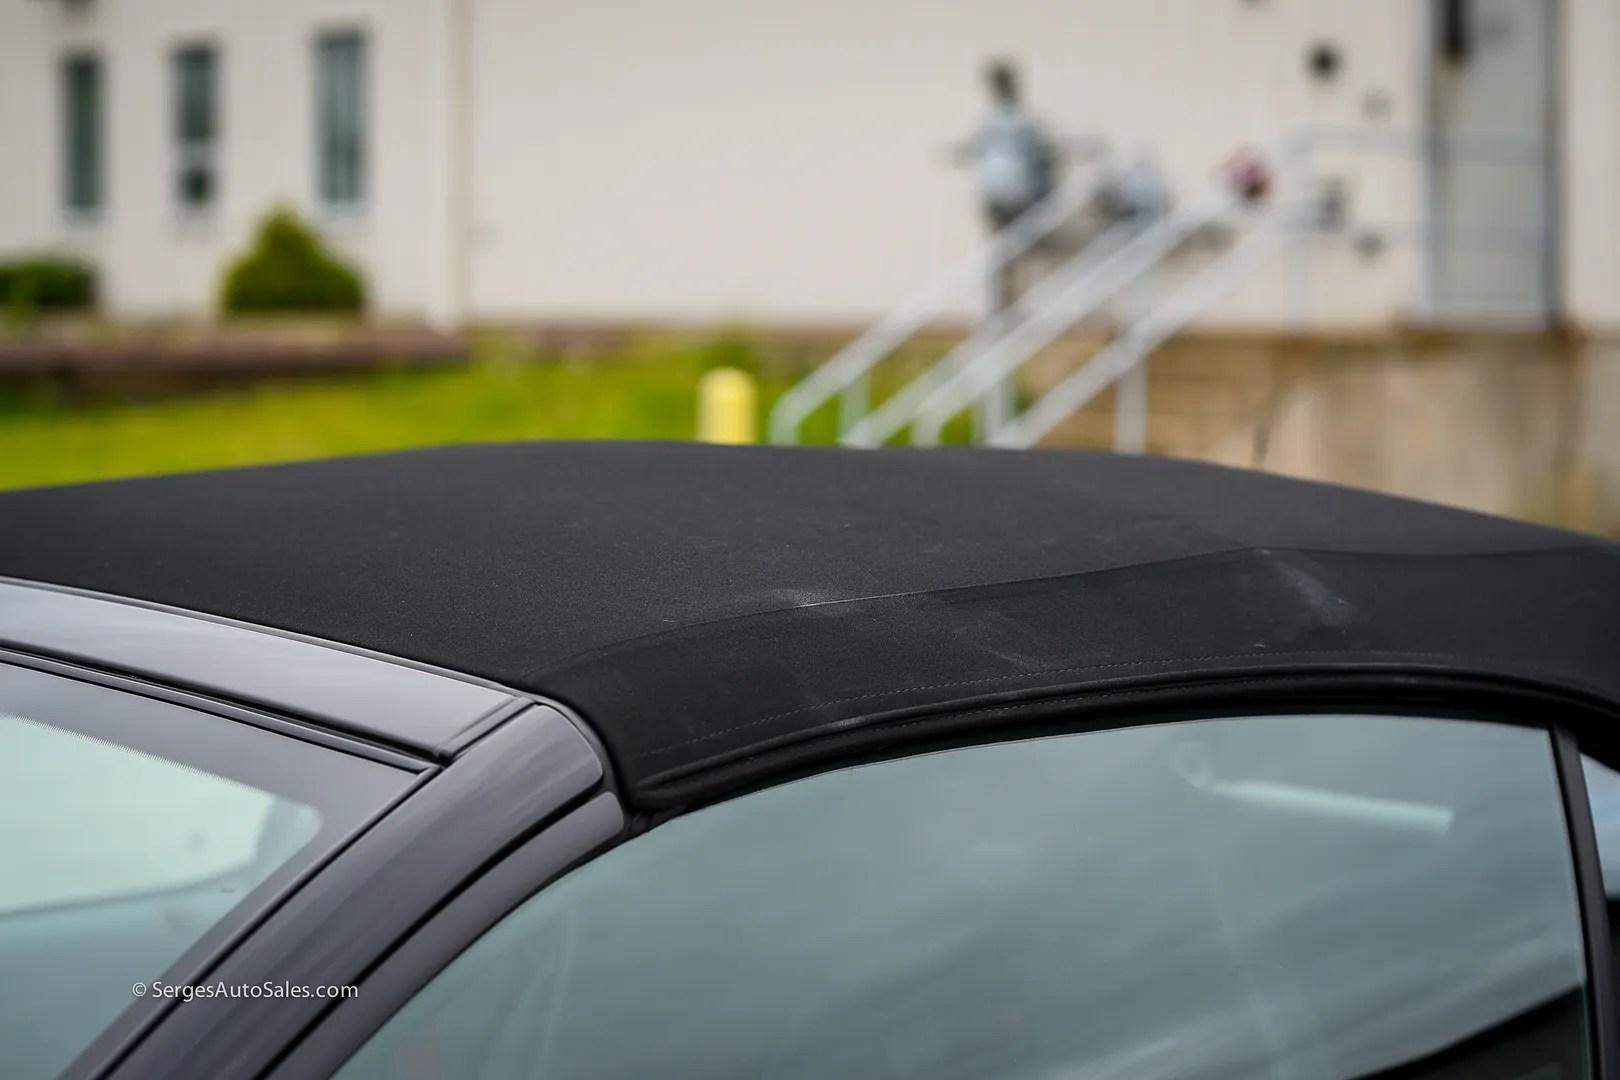 photo Serges-Auto-Sales-shelby-mustang-gt-for-sale-convertible-gt500-scranton-pa-42_zpsbkovk0w7.jpg